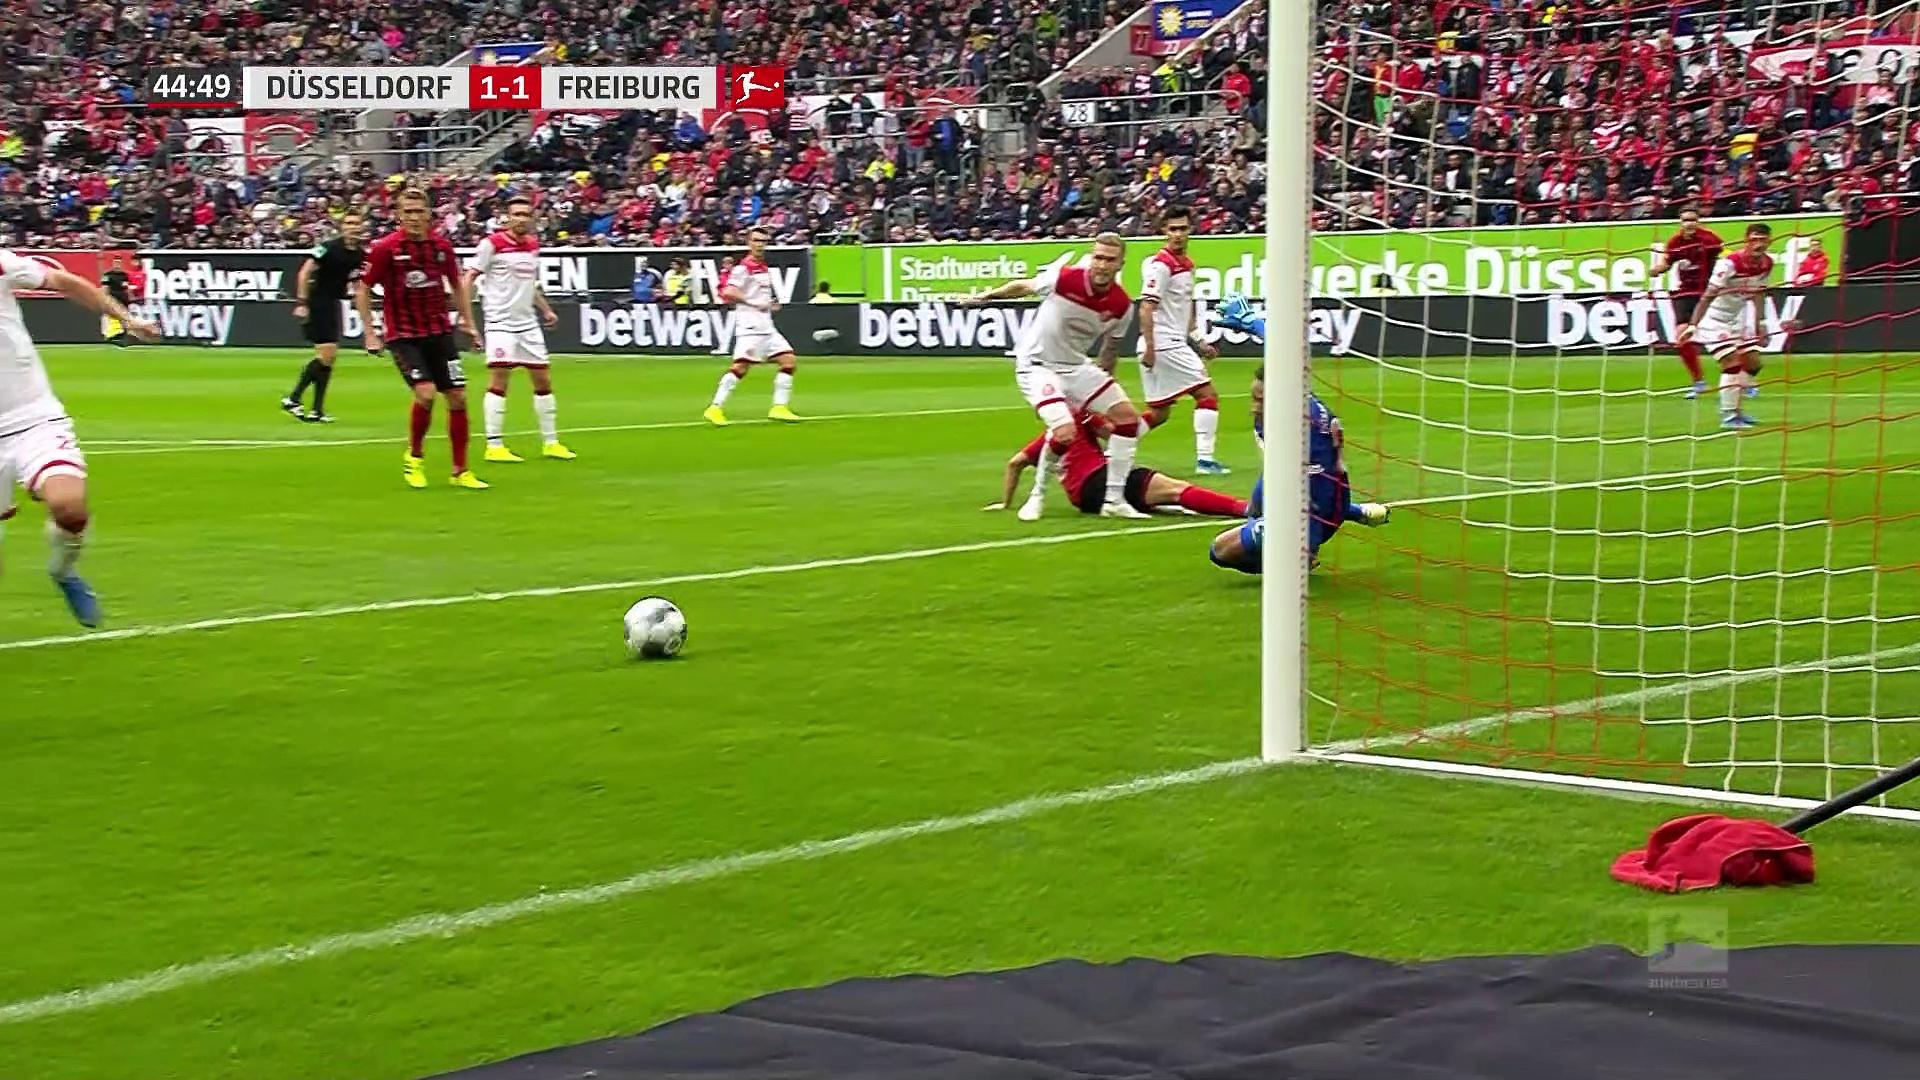 6. Hafta / Fortuna Düsseldorf - Freiburg: 1-2 (Özet)